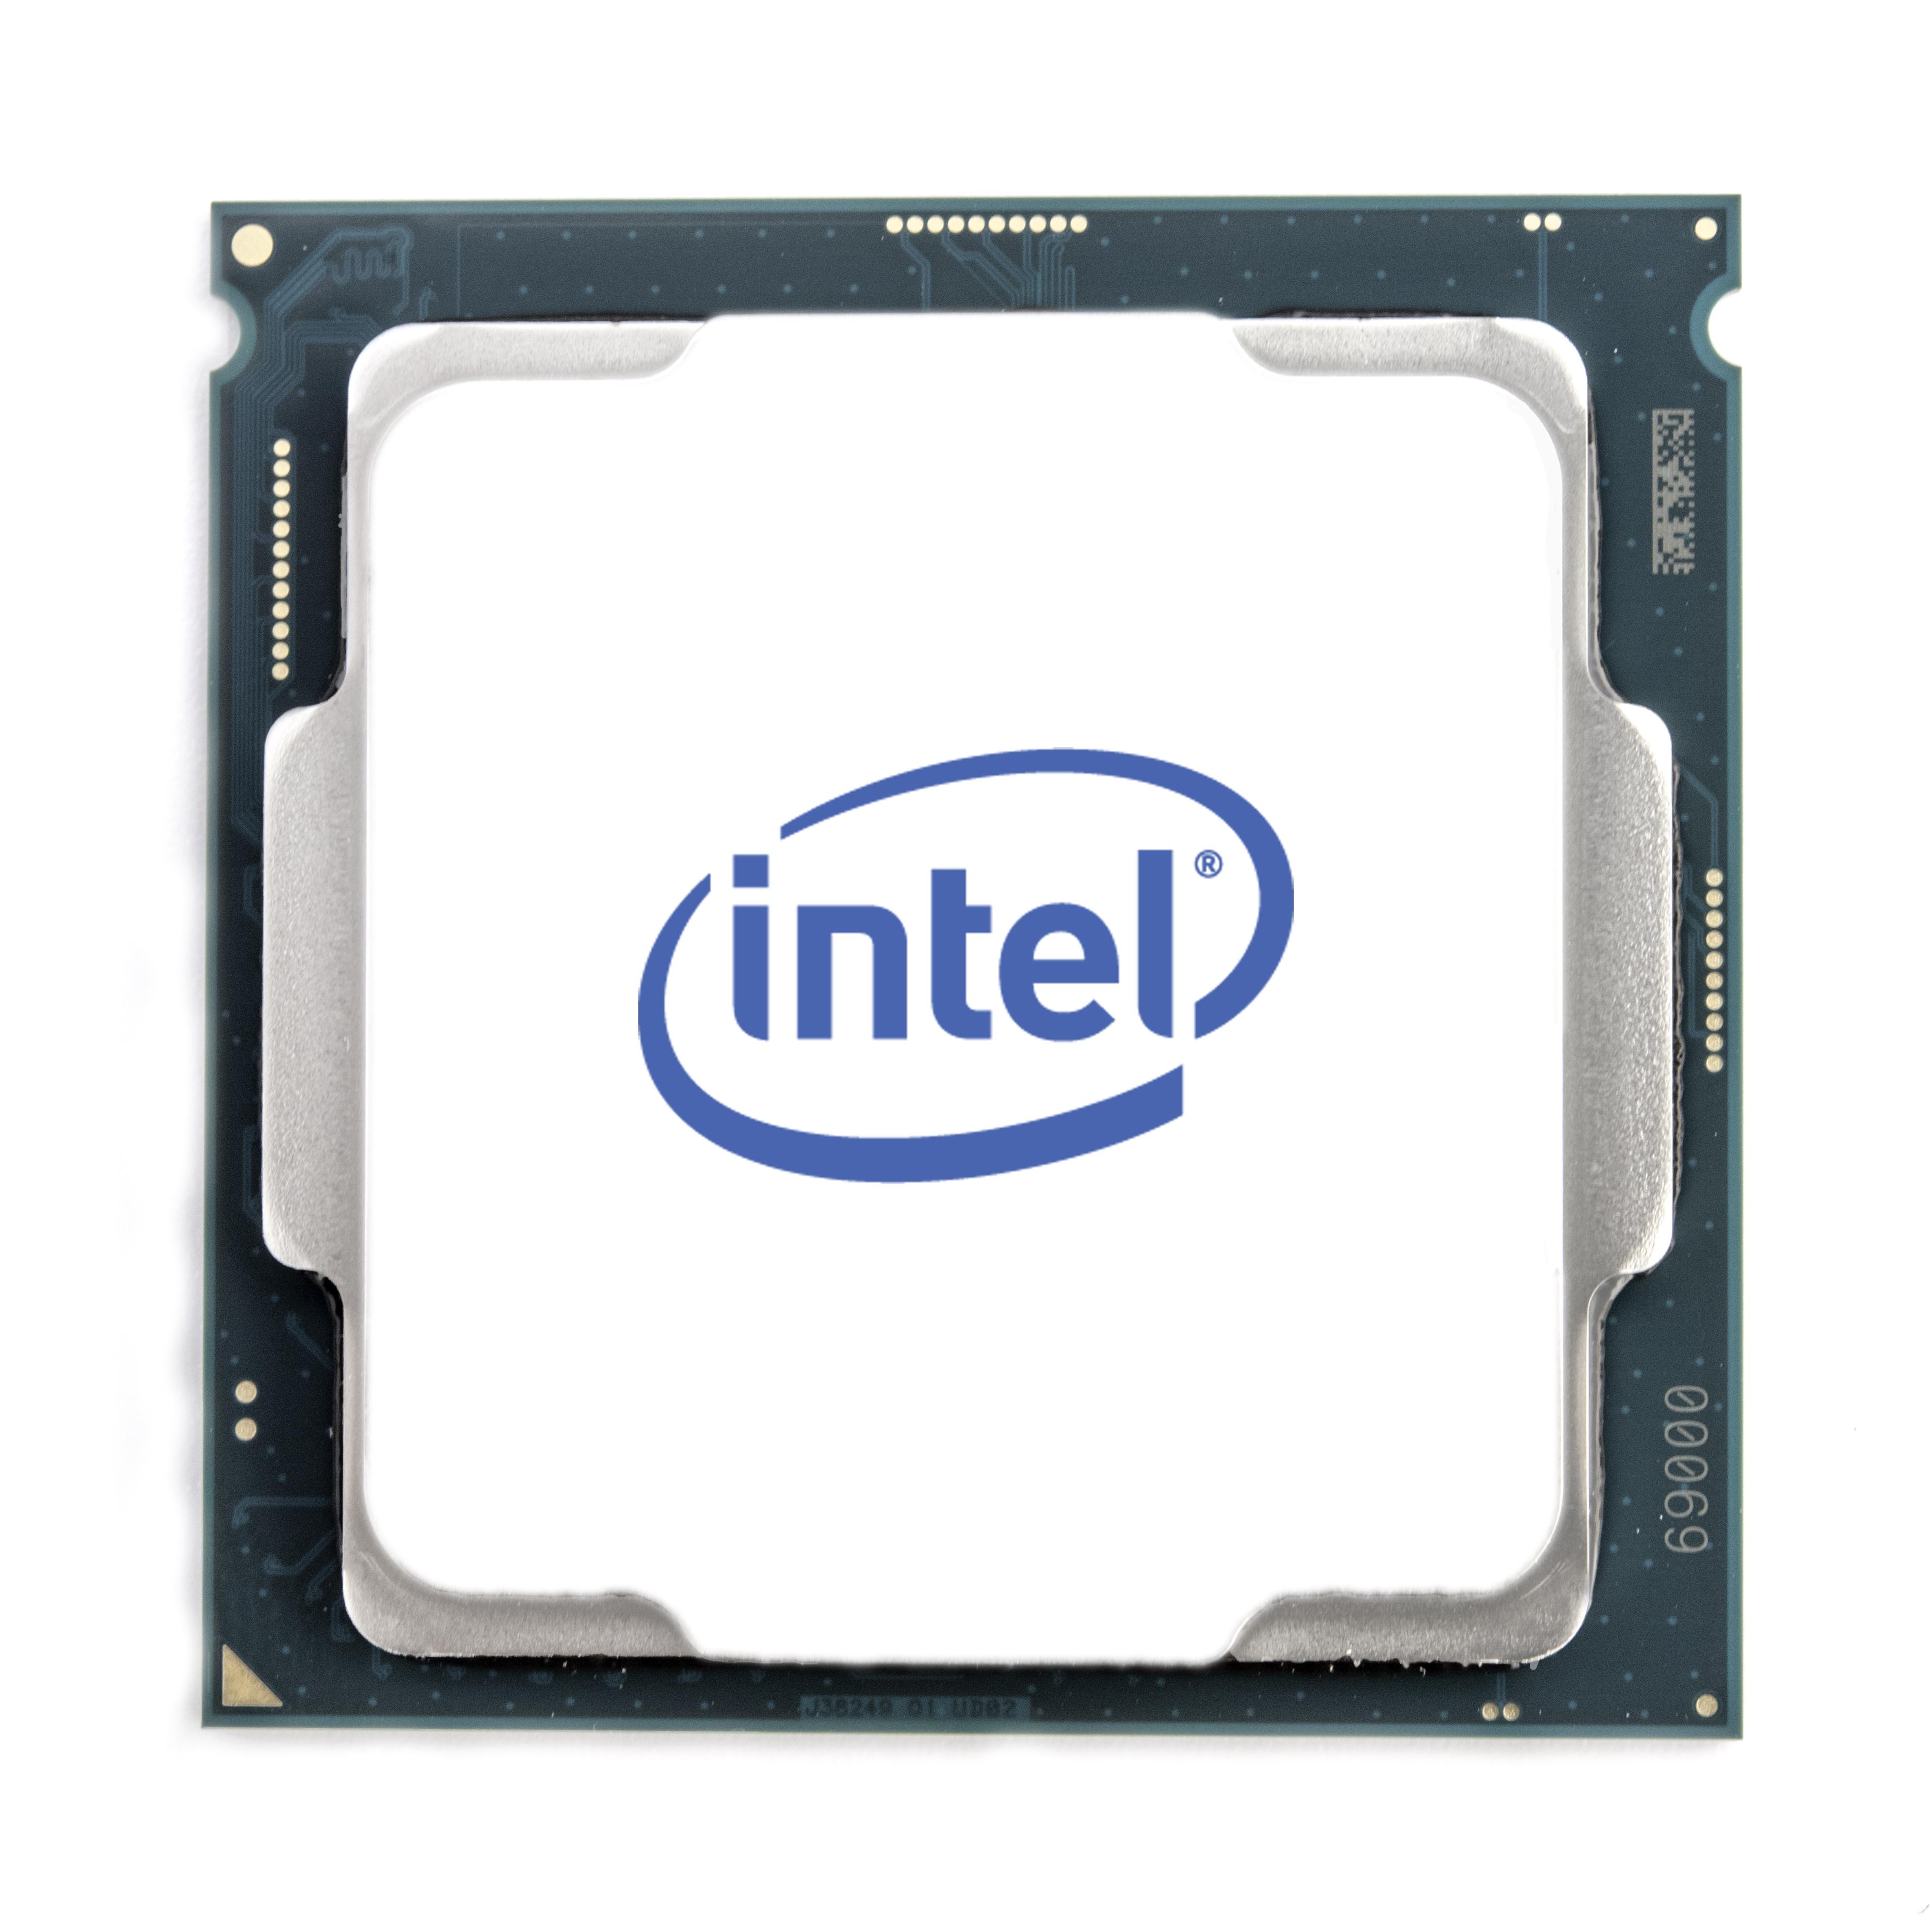 Socket 1200 : Celeron G5905, 3,5 GHz, 2 cores, 2 threads, 4 MB cache